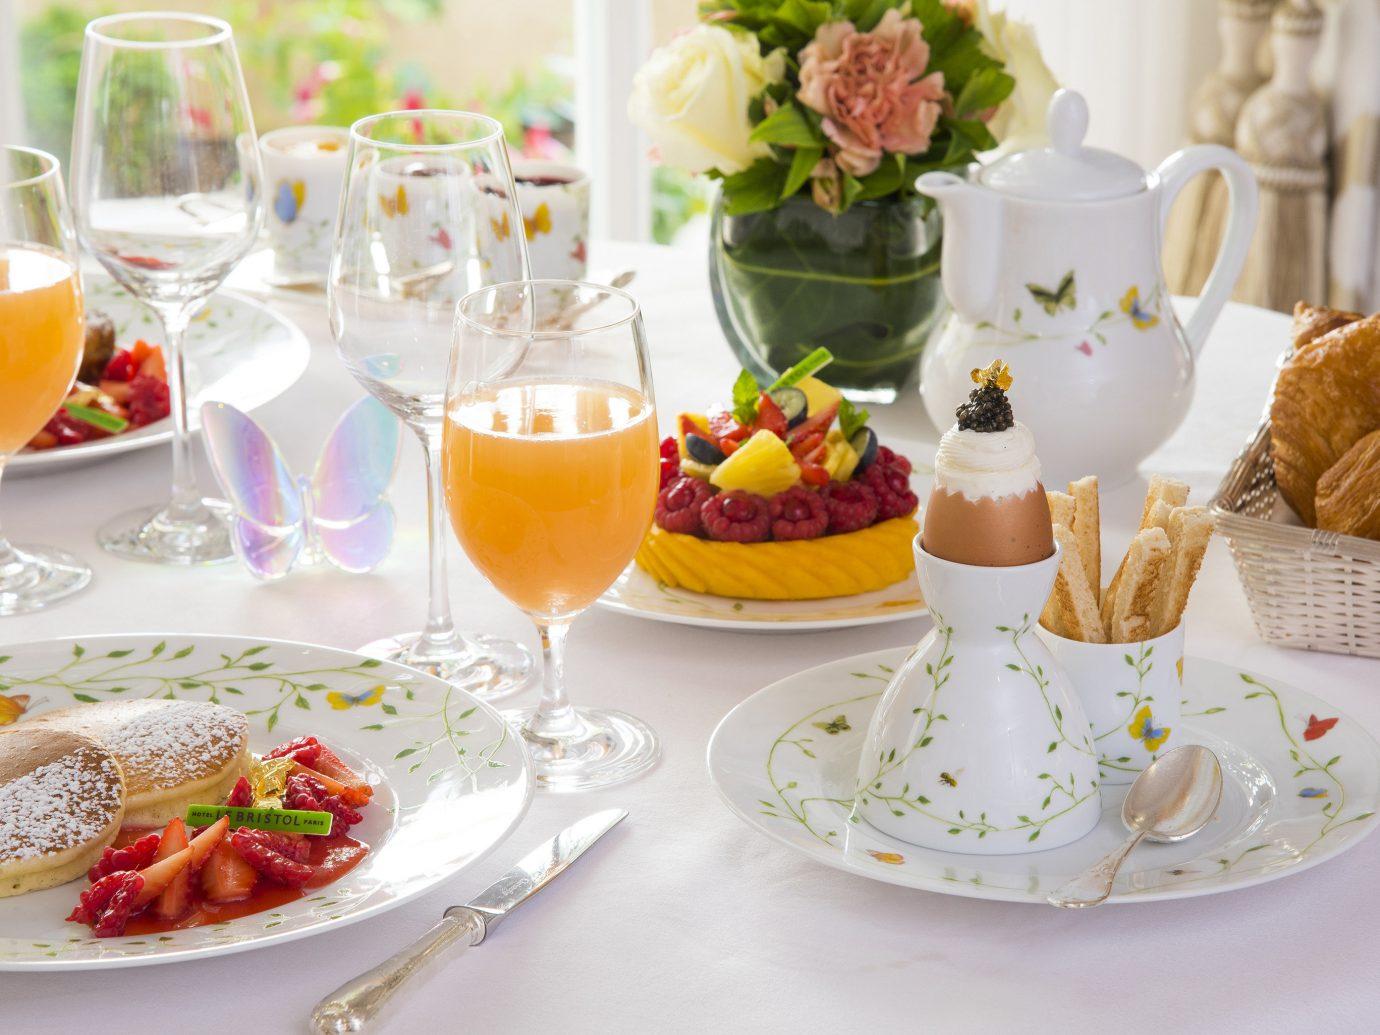 Food + Drink plate meal brunch yellow breakfast tableware food table stemware dessert serveware wine glass supper dining table